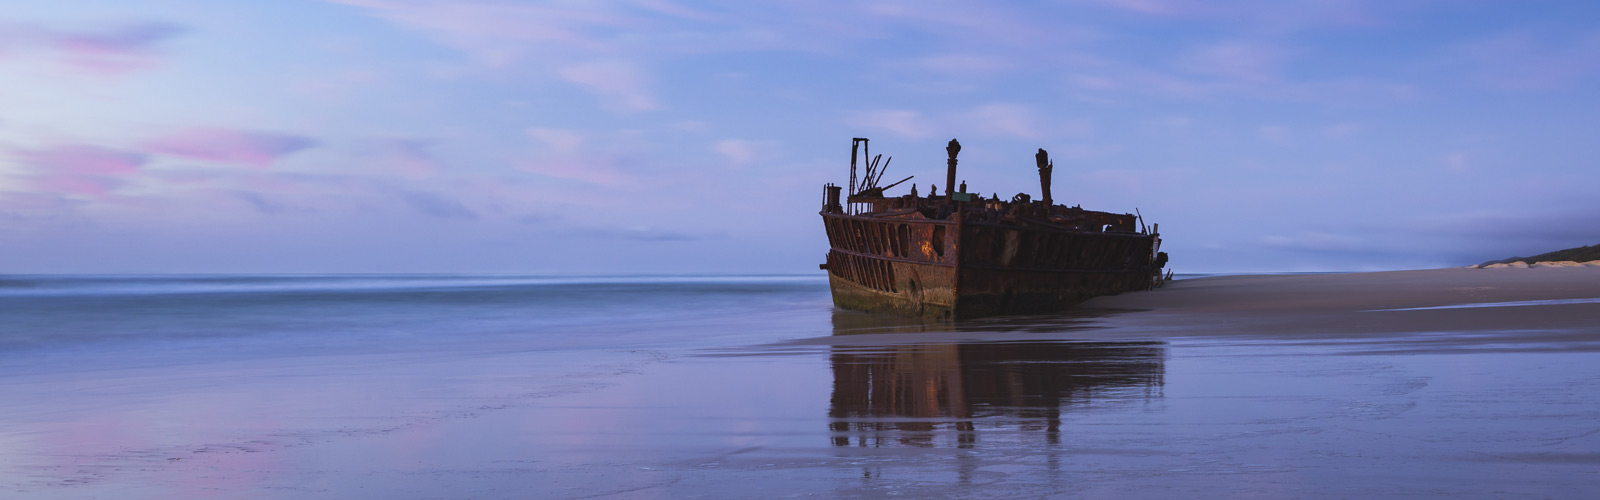 Fraser Island Shipwrecks